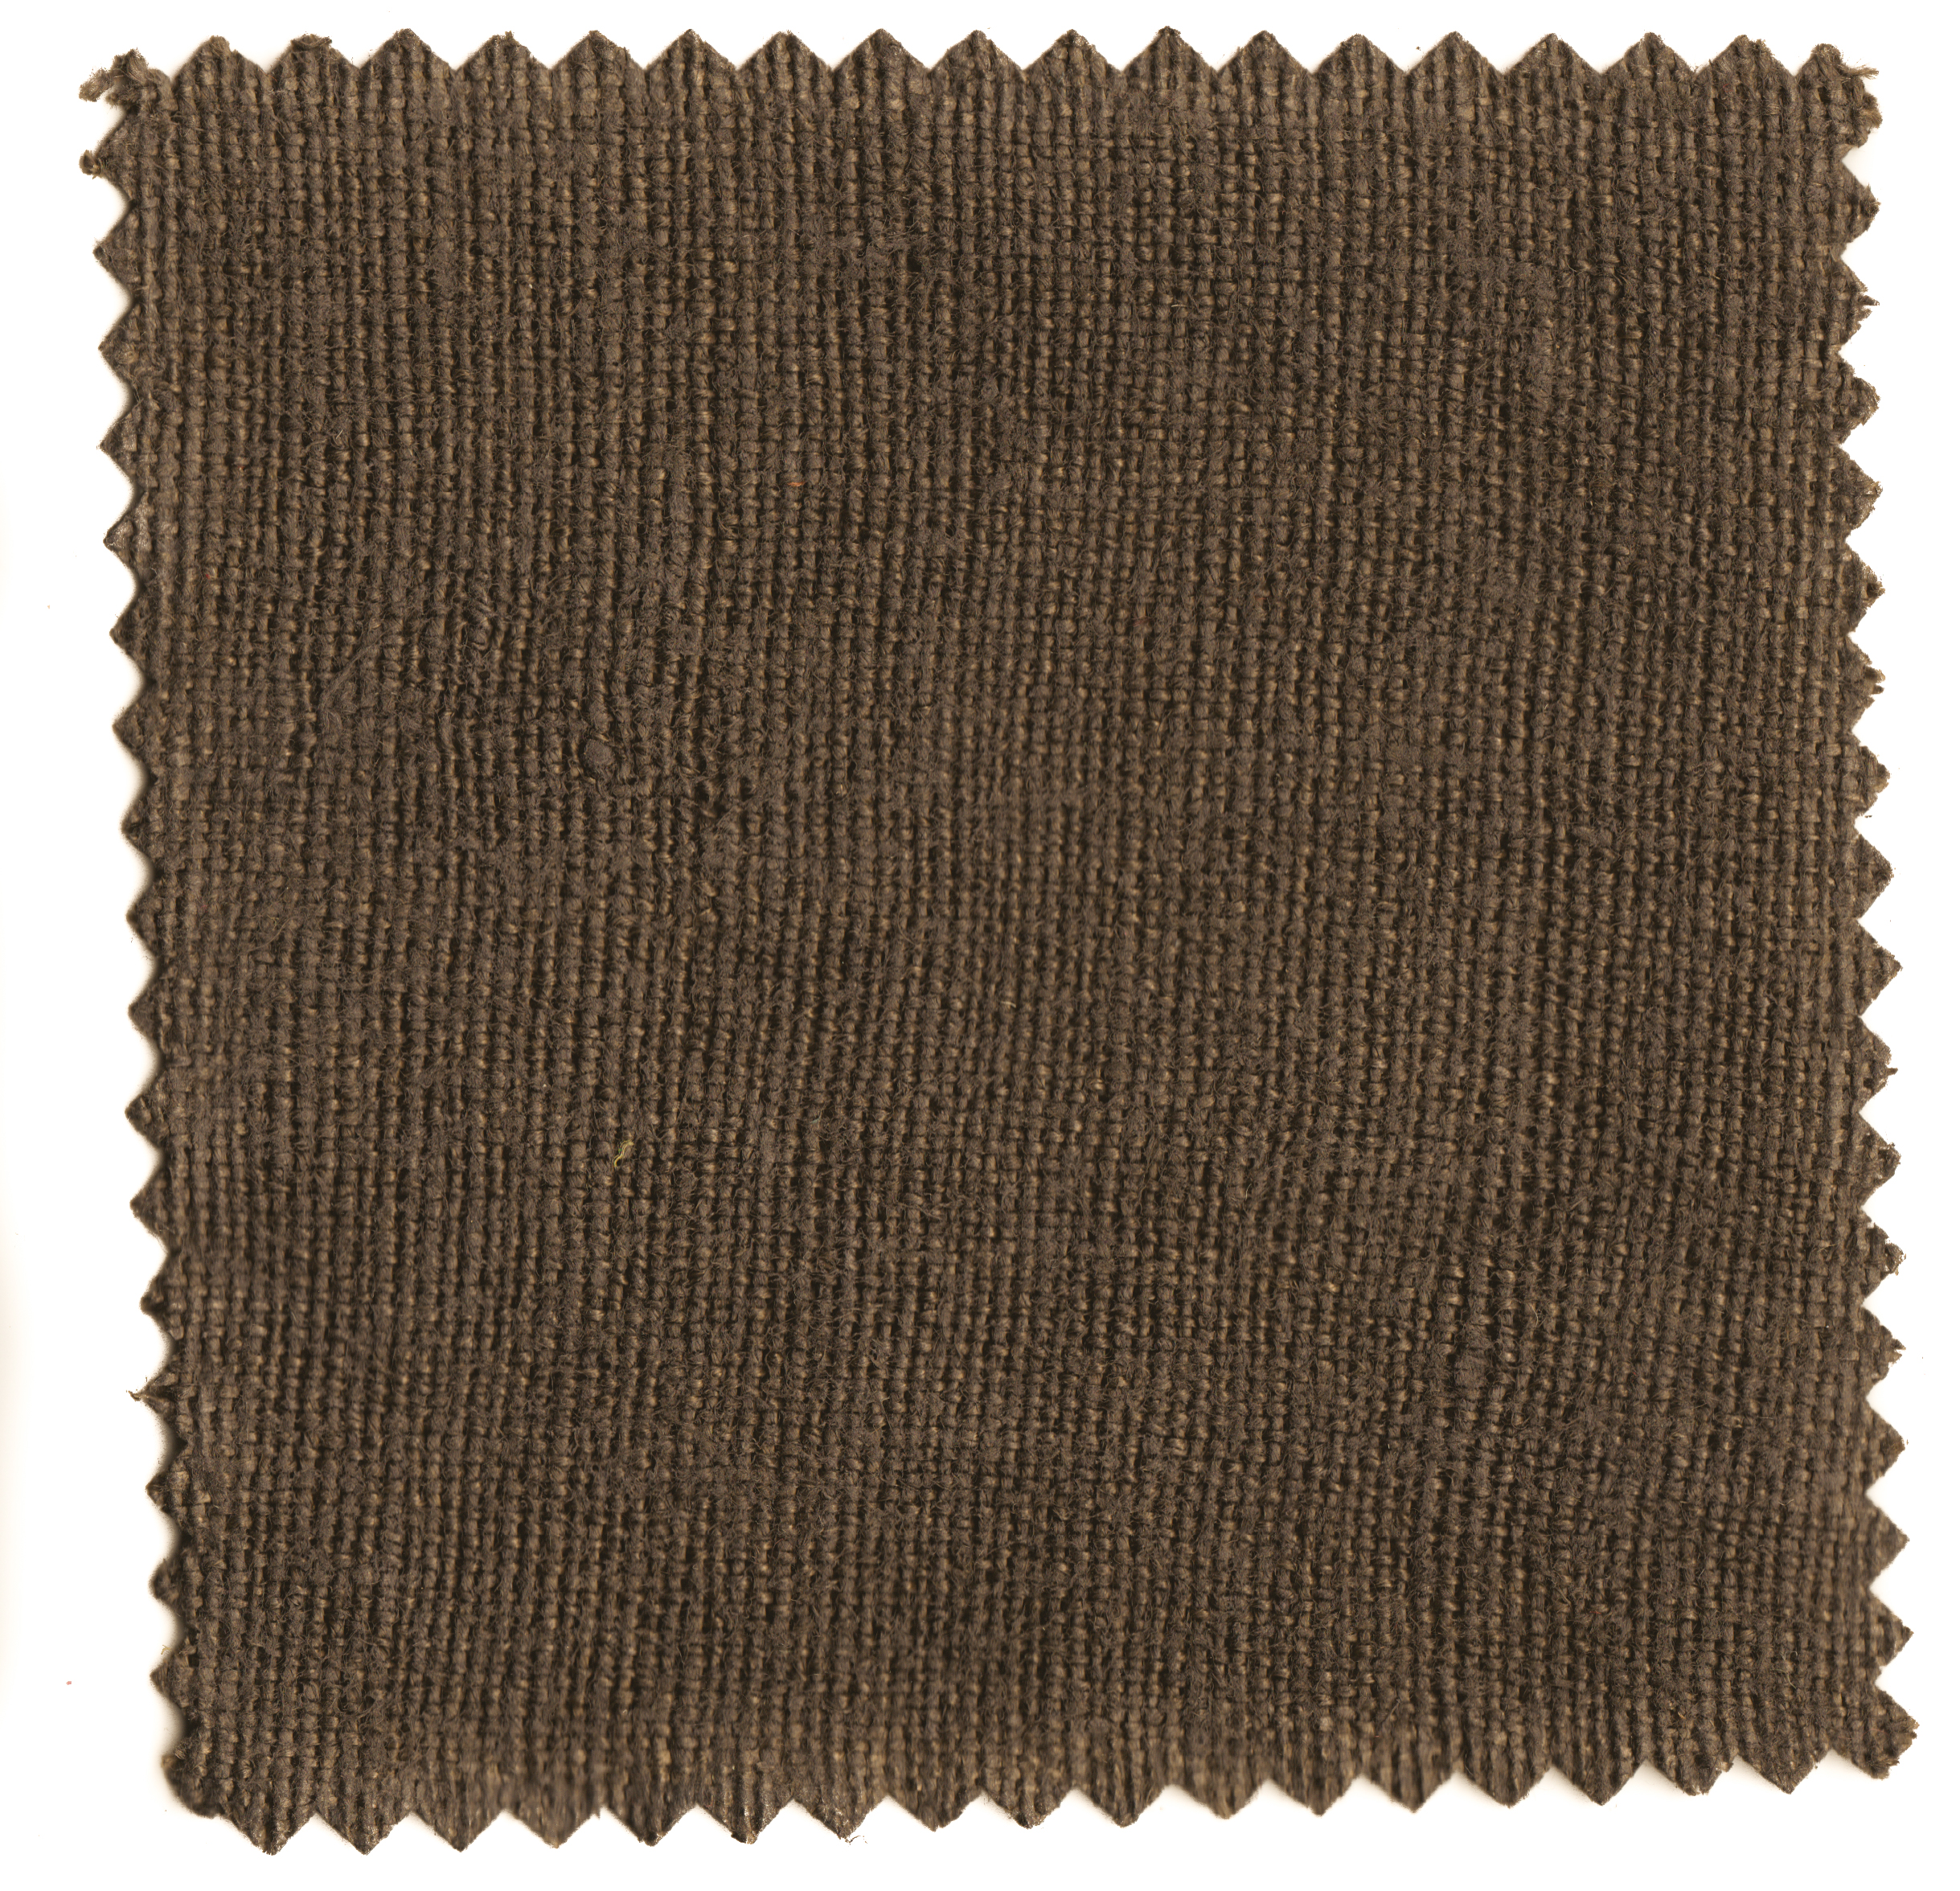 Walnut Browns-5.jpg